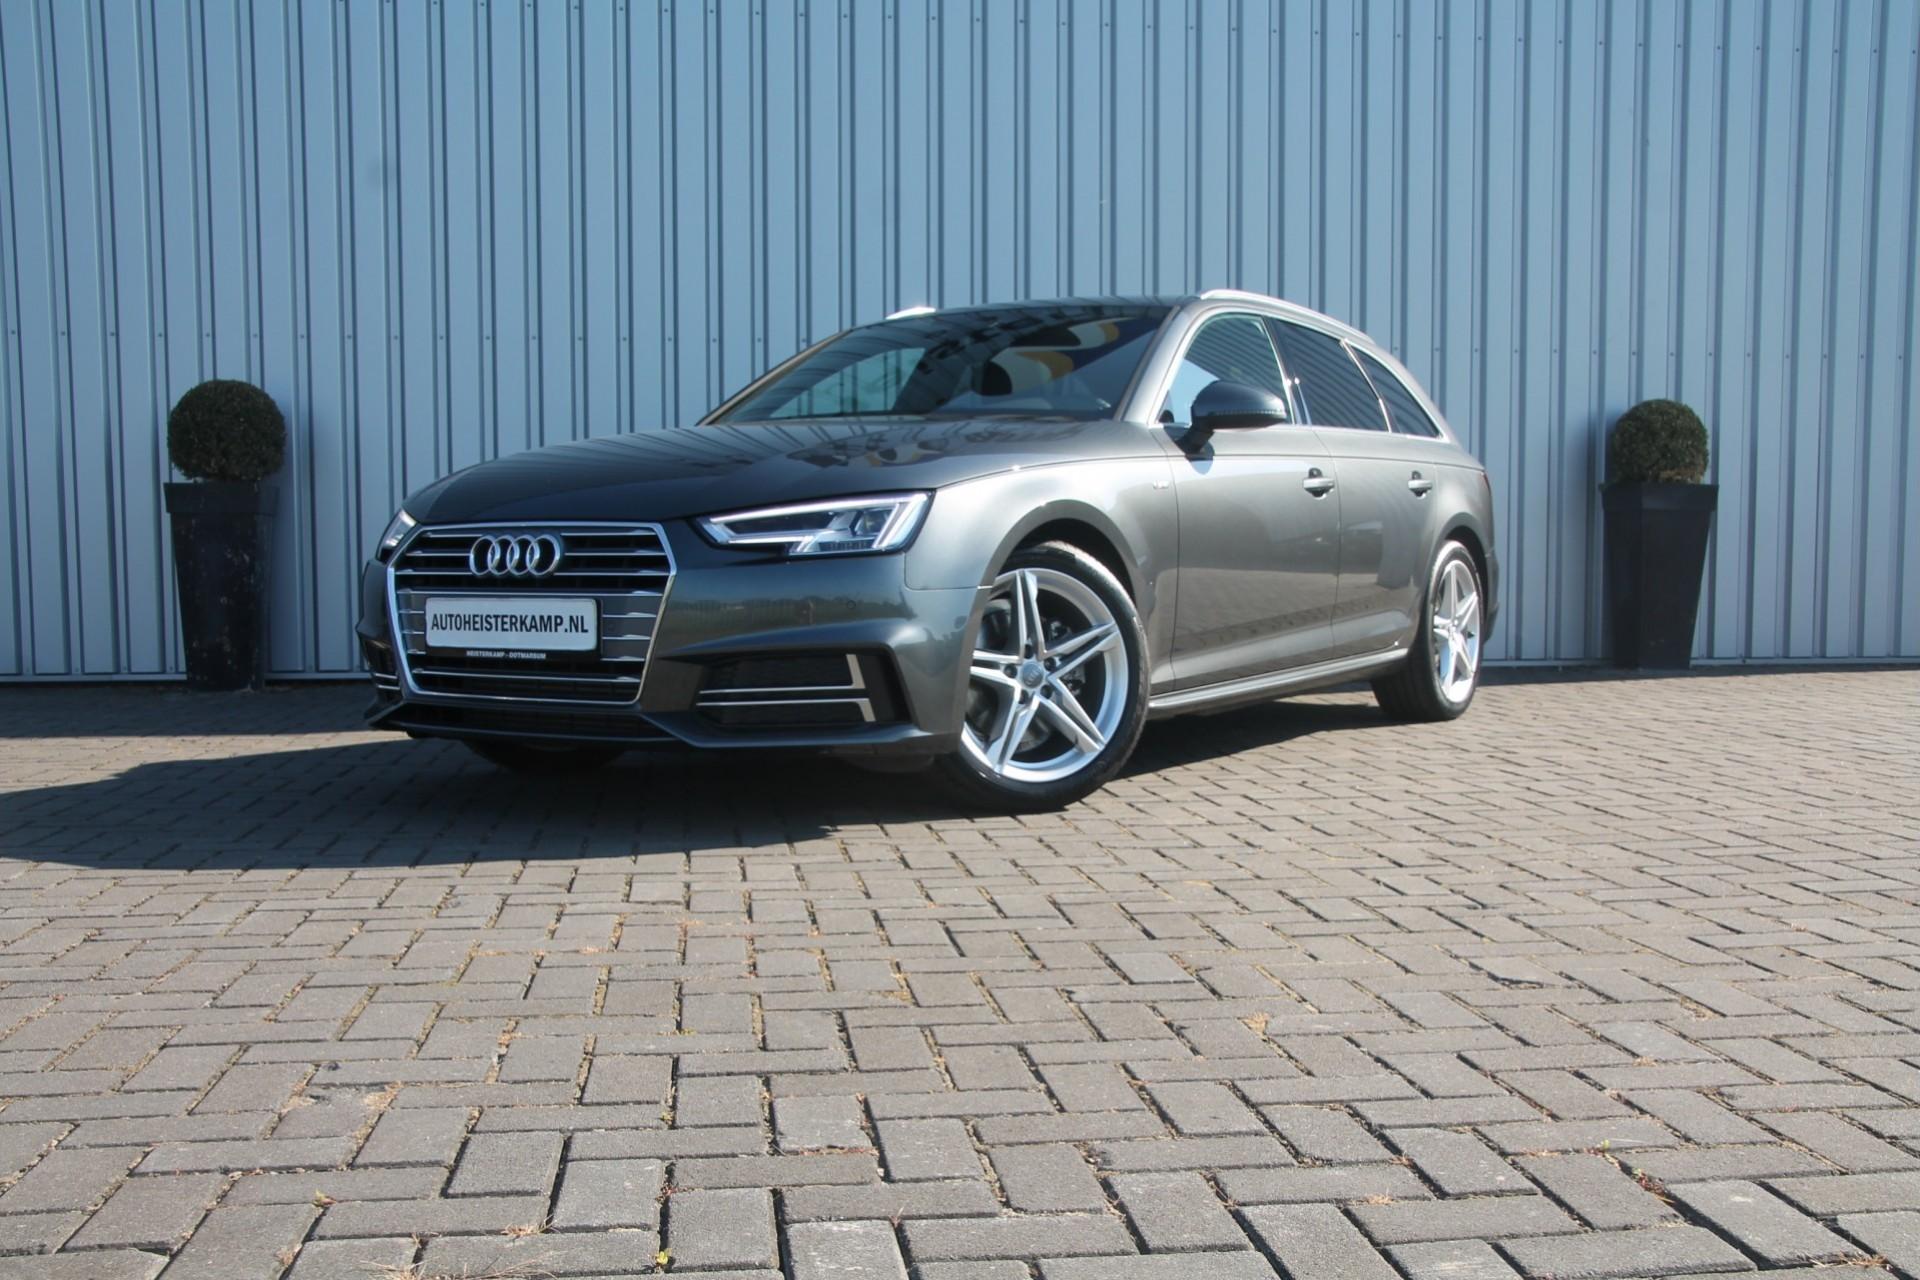 Audi A4 Avant 2.0 TFSI 190PK Ultra Sport S-Line S-tronic ...